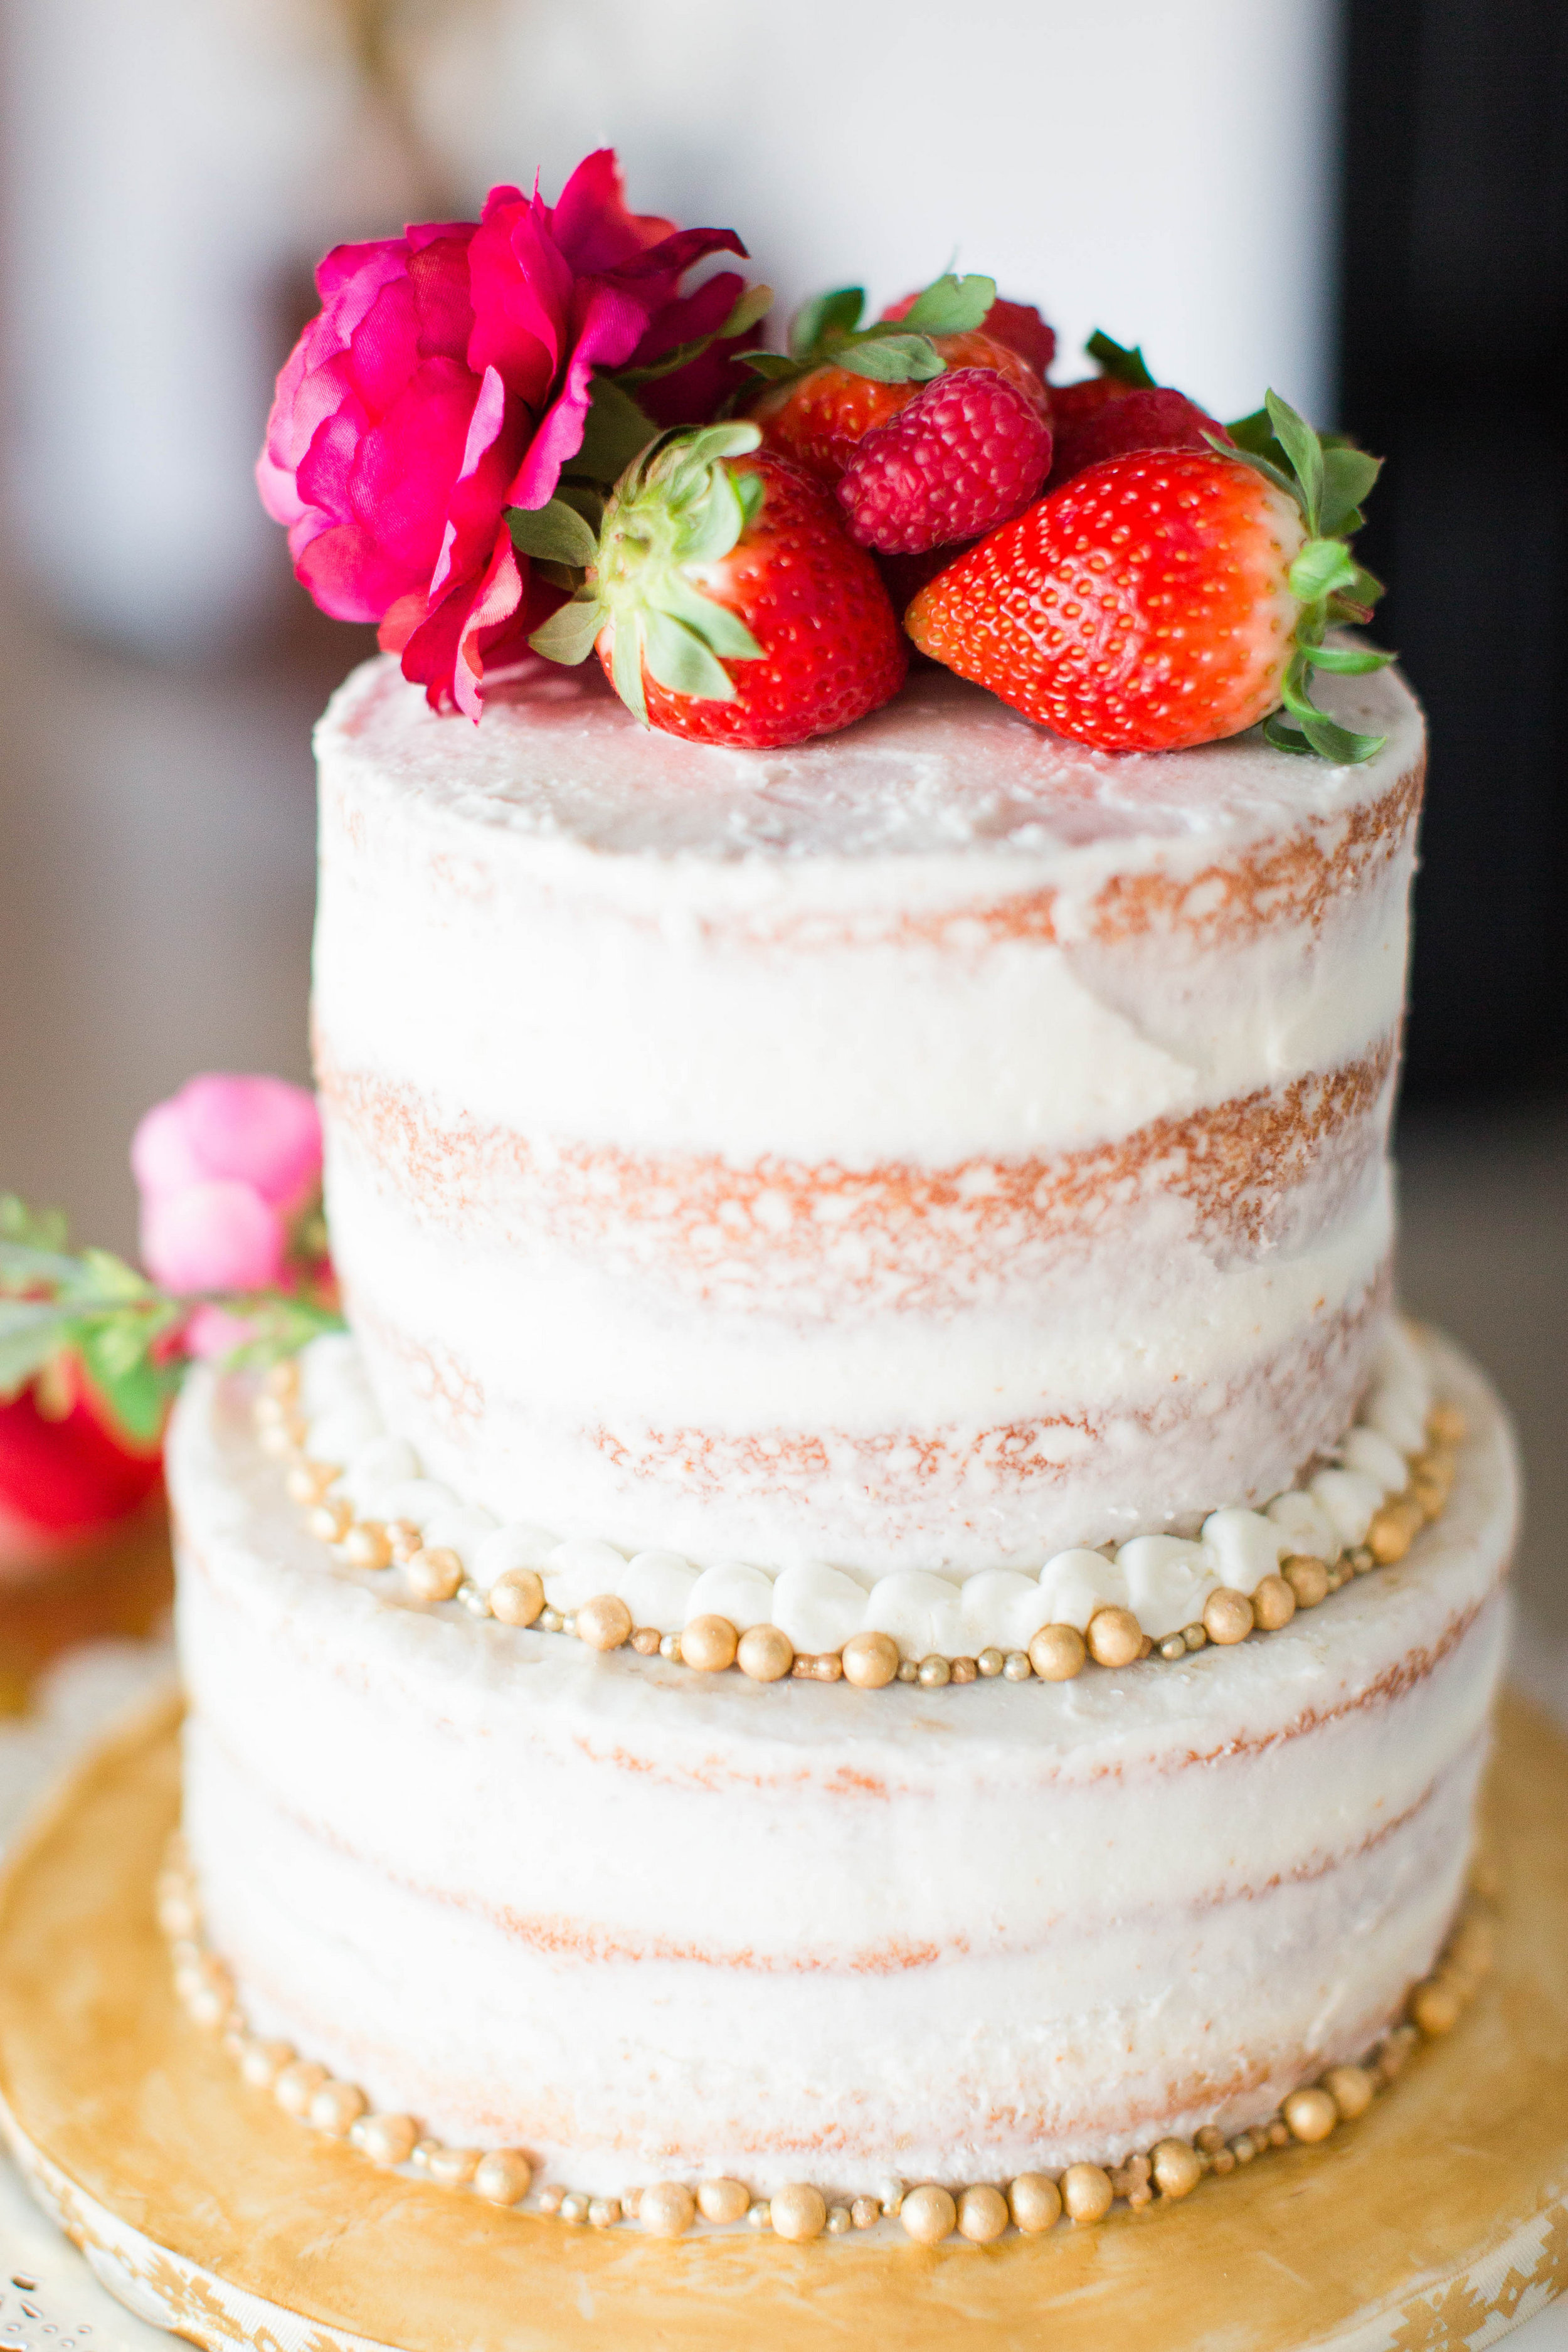 afloral-fake-flower-wedding-ivory-and-beau-bridal-boutique-maggie-sottero-saffron-the-hall-on-vine-wedding-statesboro-wedding-savannah-wedding-kristian-designs-rachel-strickland-photography-savannah-bridal-southern-bride-savannah-bride-24.jpg